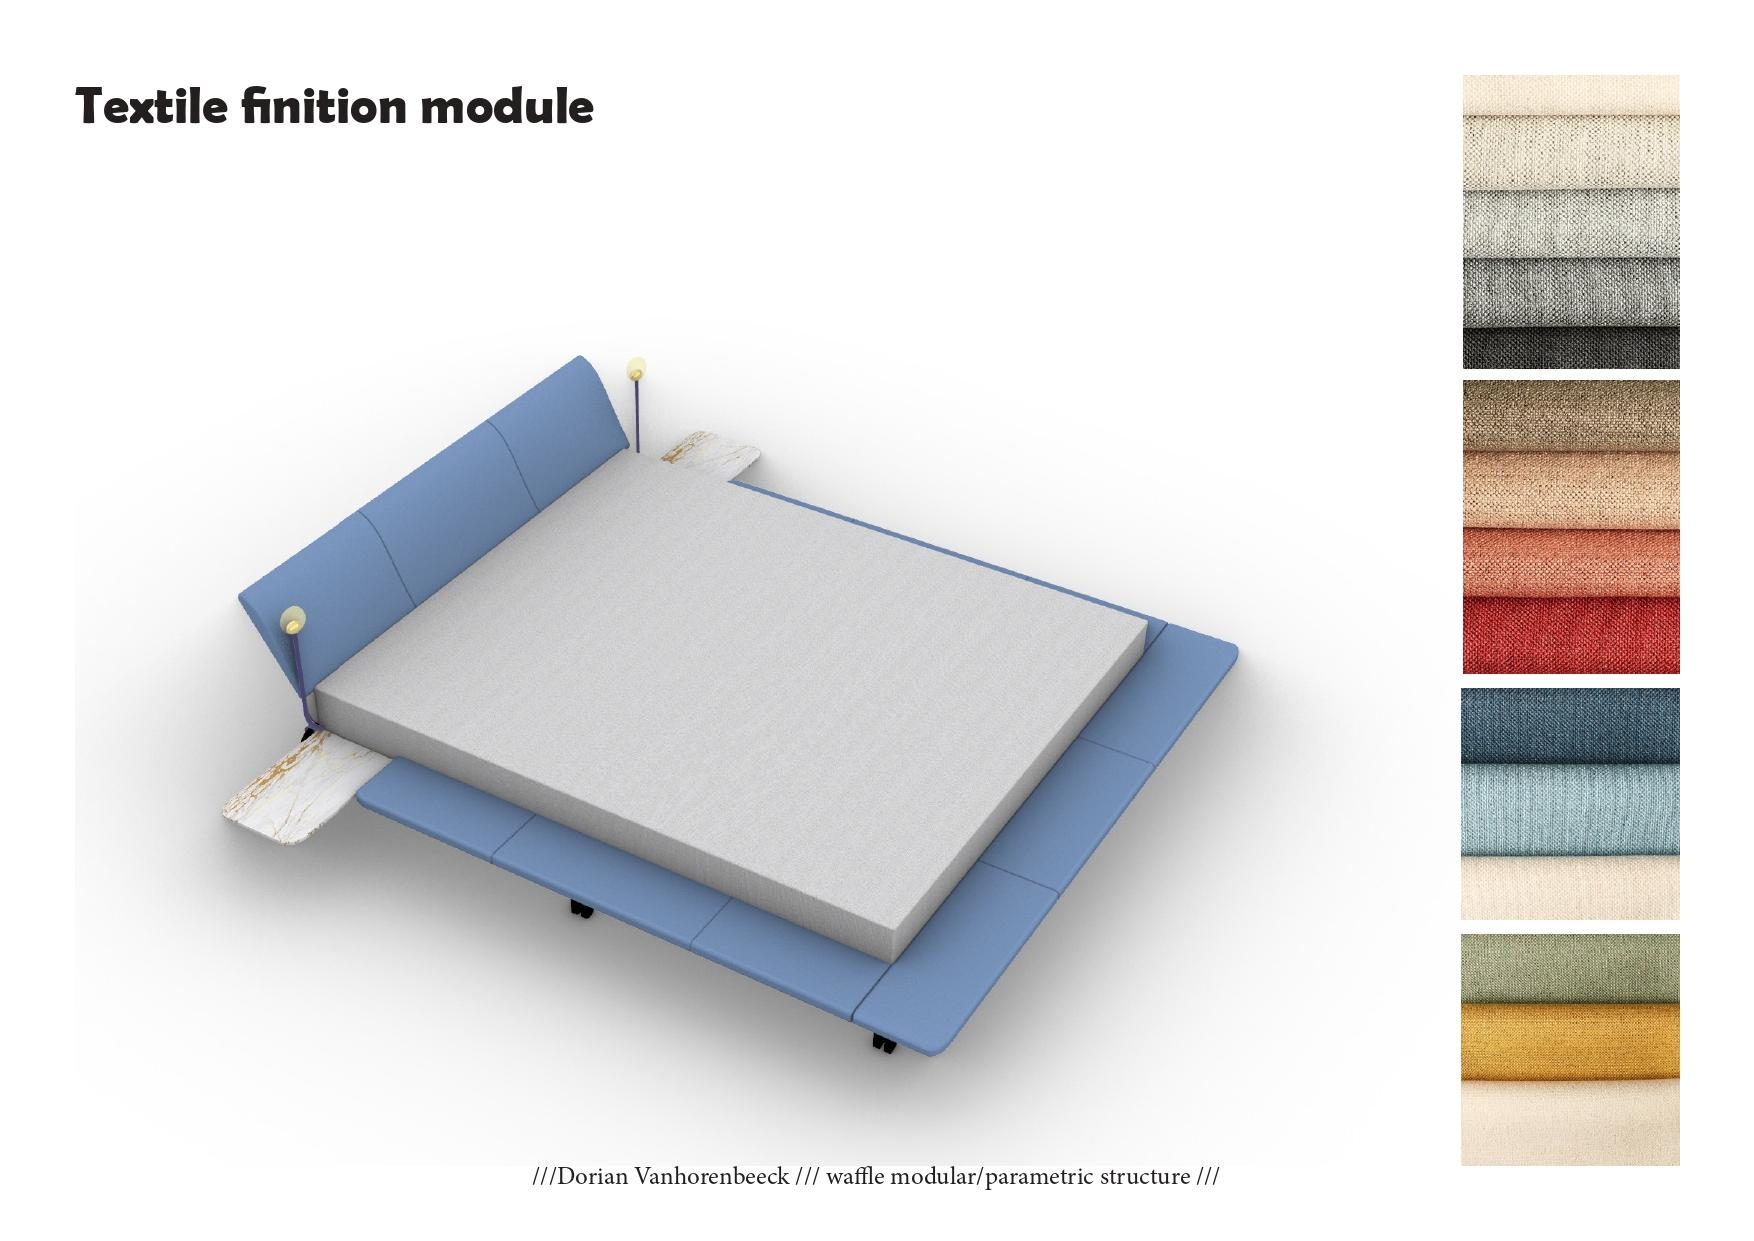 Livret Waffle modular-parametric Structure Dorian Vanhorenbeeck_page-0012